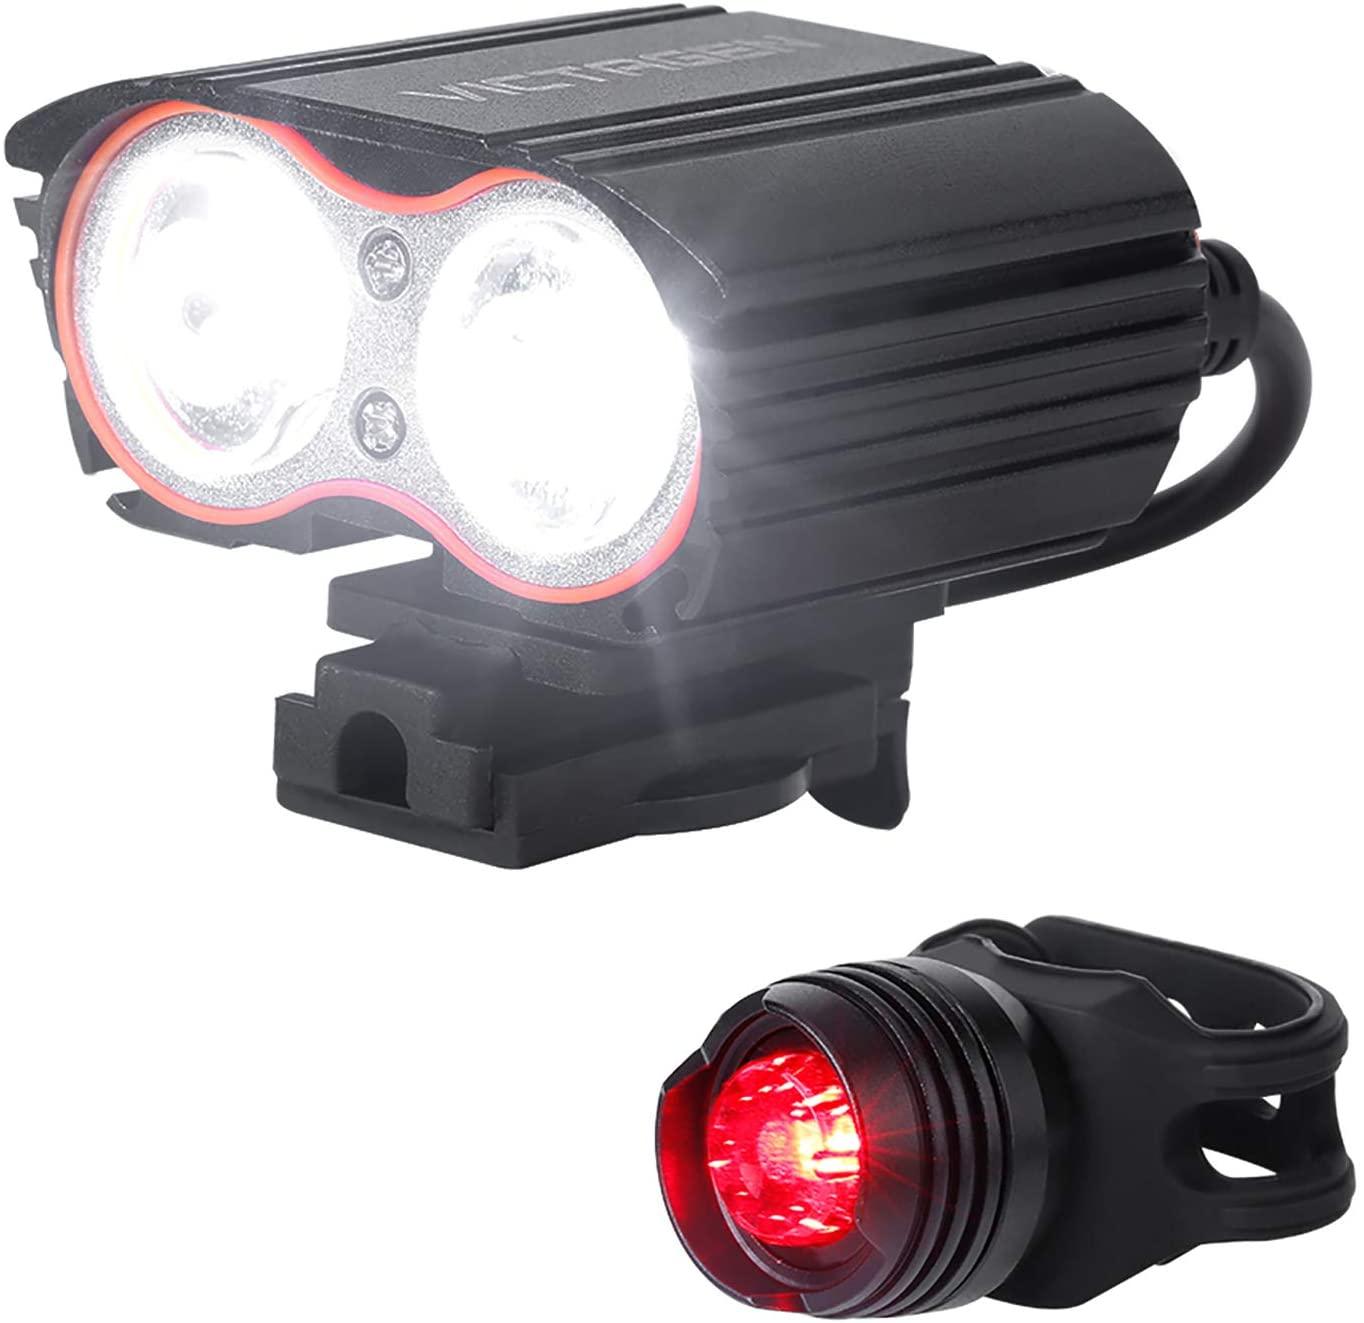 Bicycle Light USB Rechargeable Super Bike Headlight